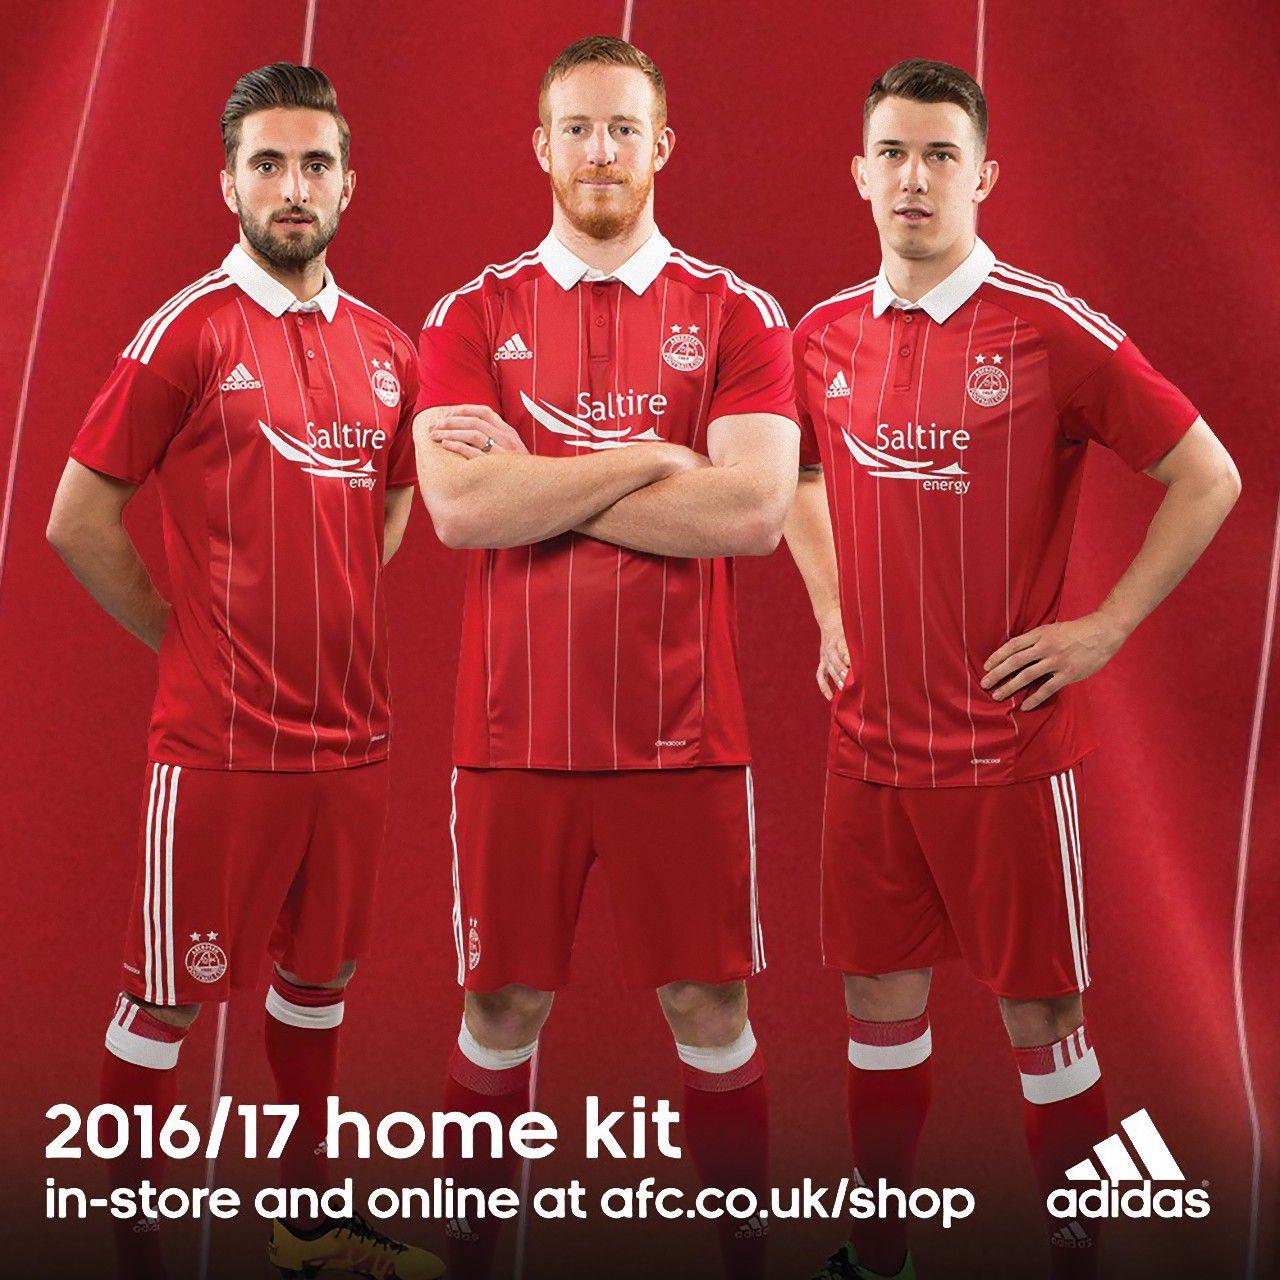 https://1.bp.blogspot.com/-gxCEWcYufWw/V0EoM0chx3I/AAAAAAAAUHc/PohaVSU92HATWgQ0Uzln9K4TwnZORfuRACLcB/s1600/Aberdeen-2016-17-kit-home-adidas-01.jpg